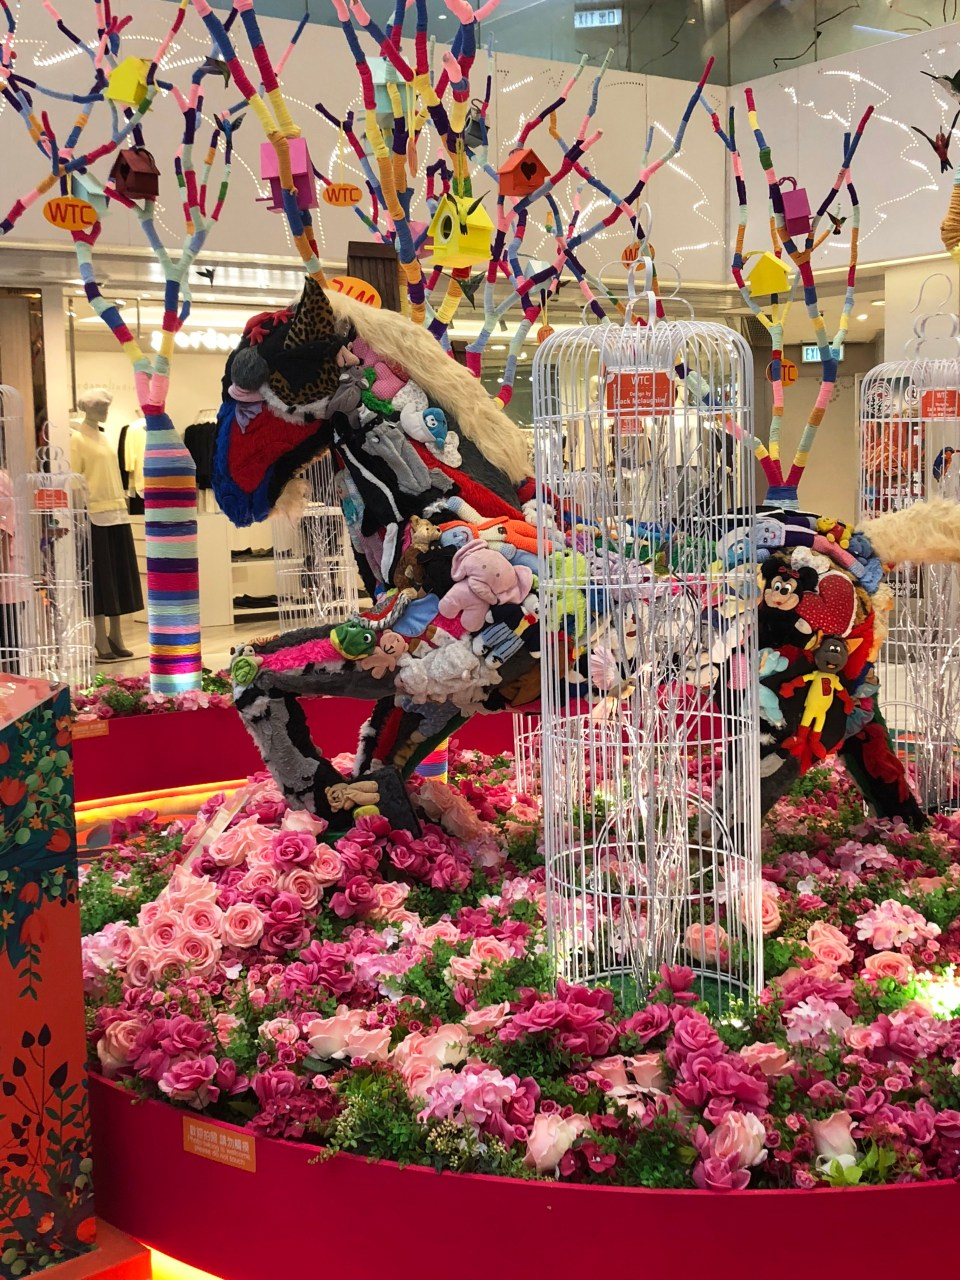 Hong Kong mall - stuffed animal horse display